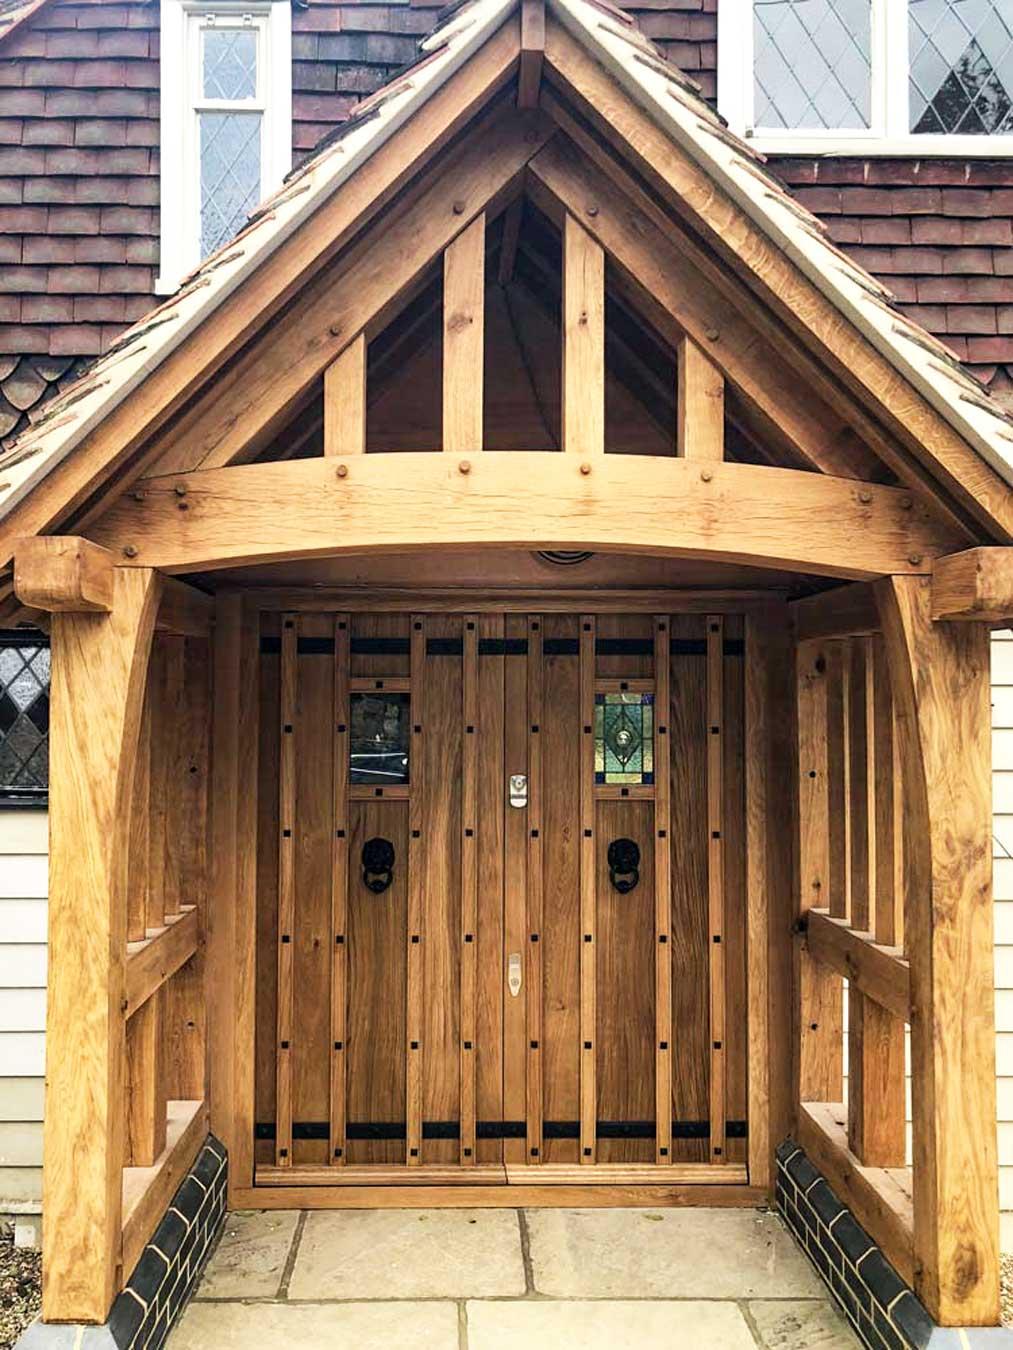 Timber oak Entrance Doors in oil finish Oil